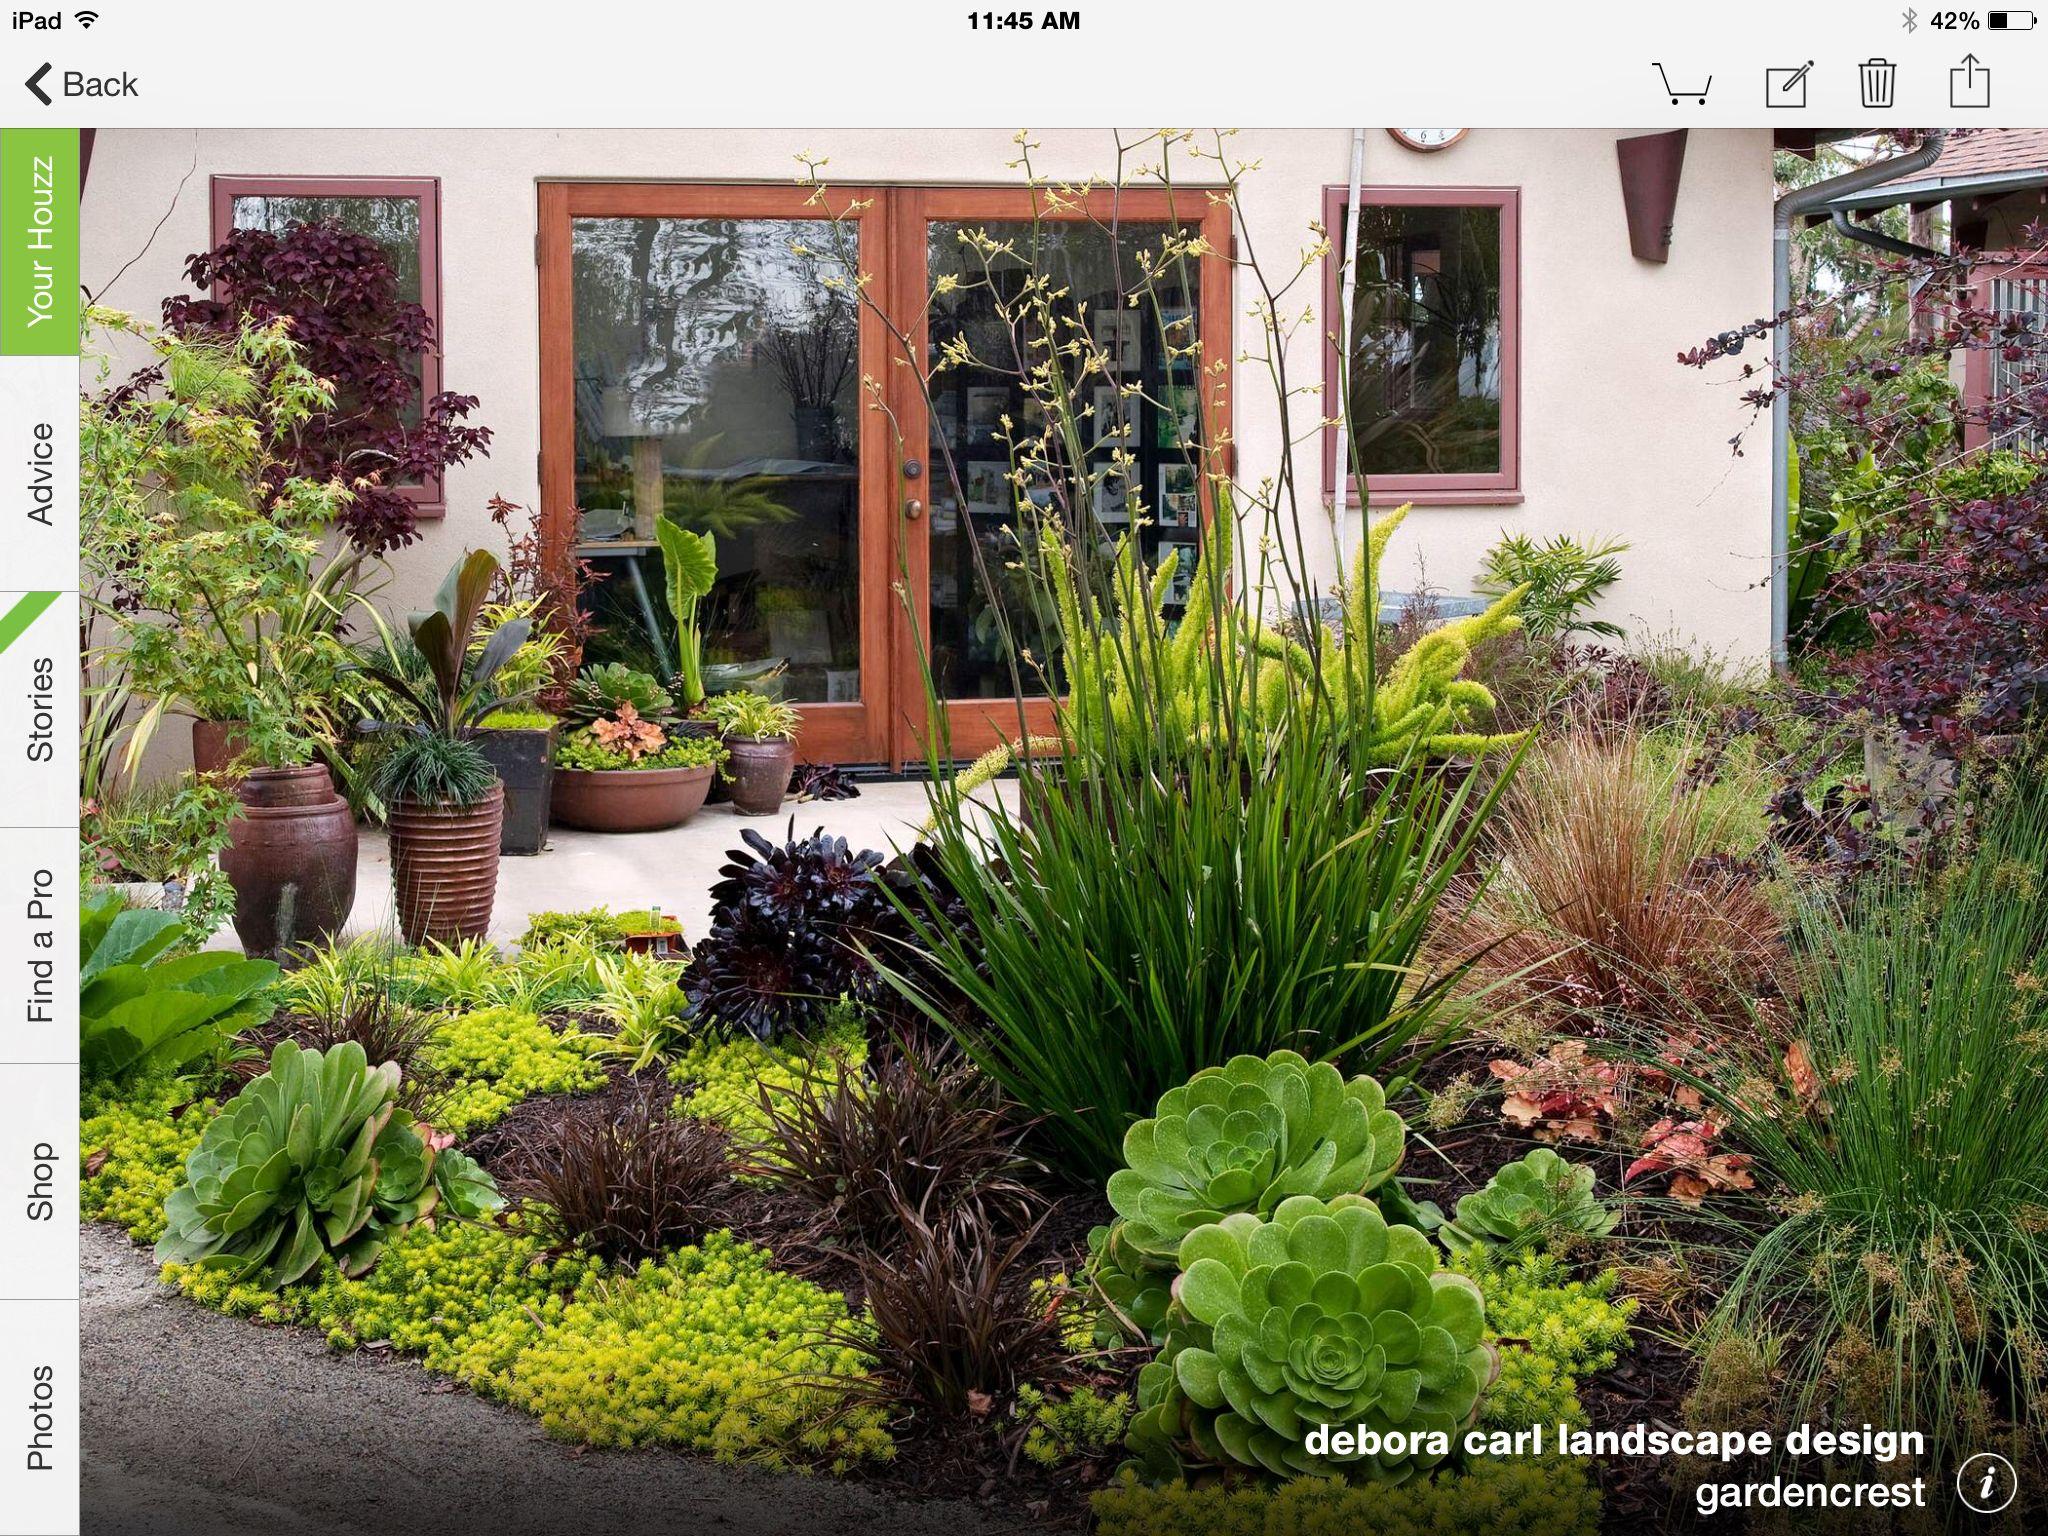 Good Drought Tolerant Landscape, Succulents, Mediterranean Garden, Houzz.com